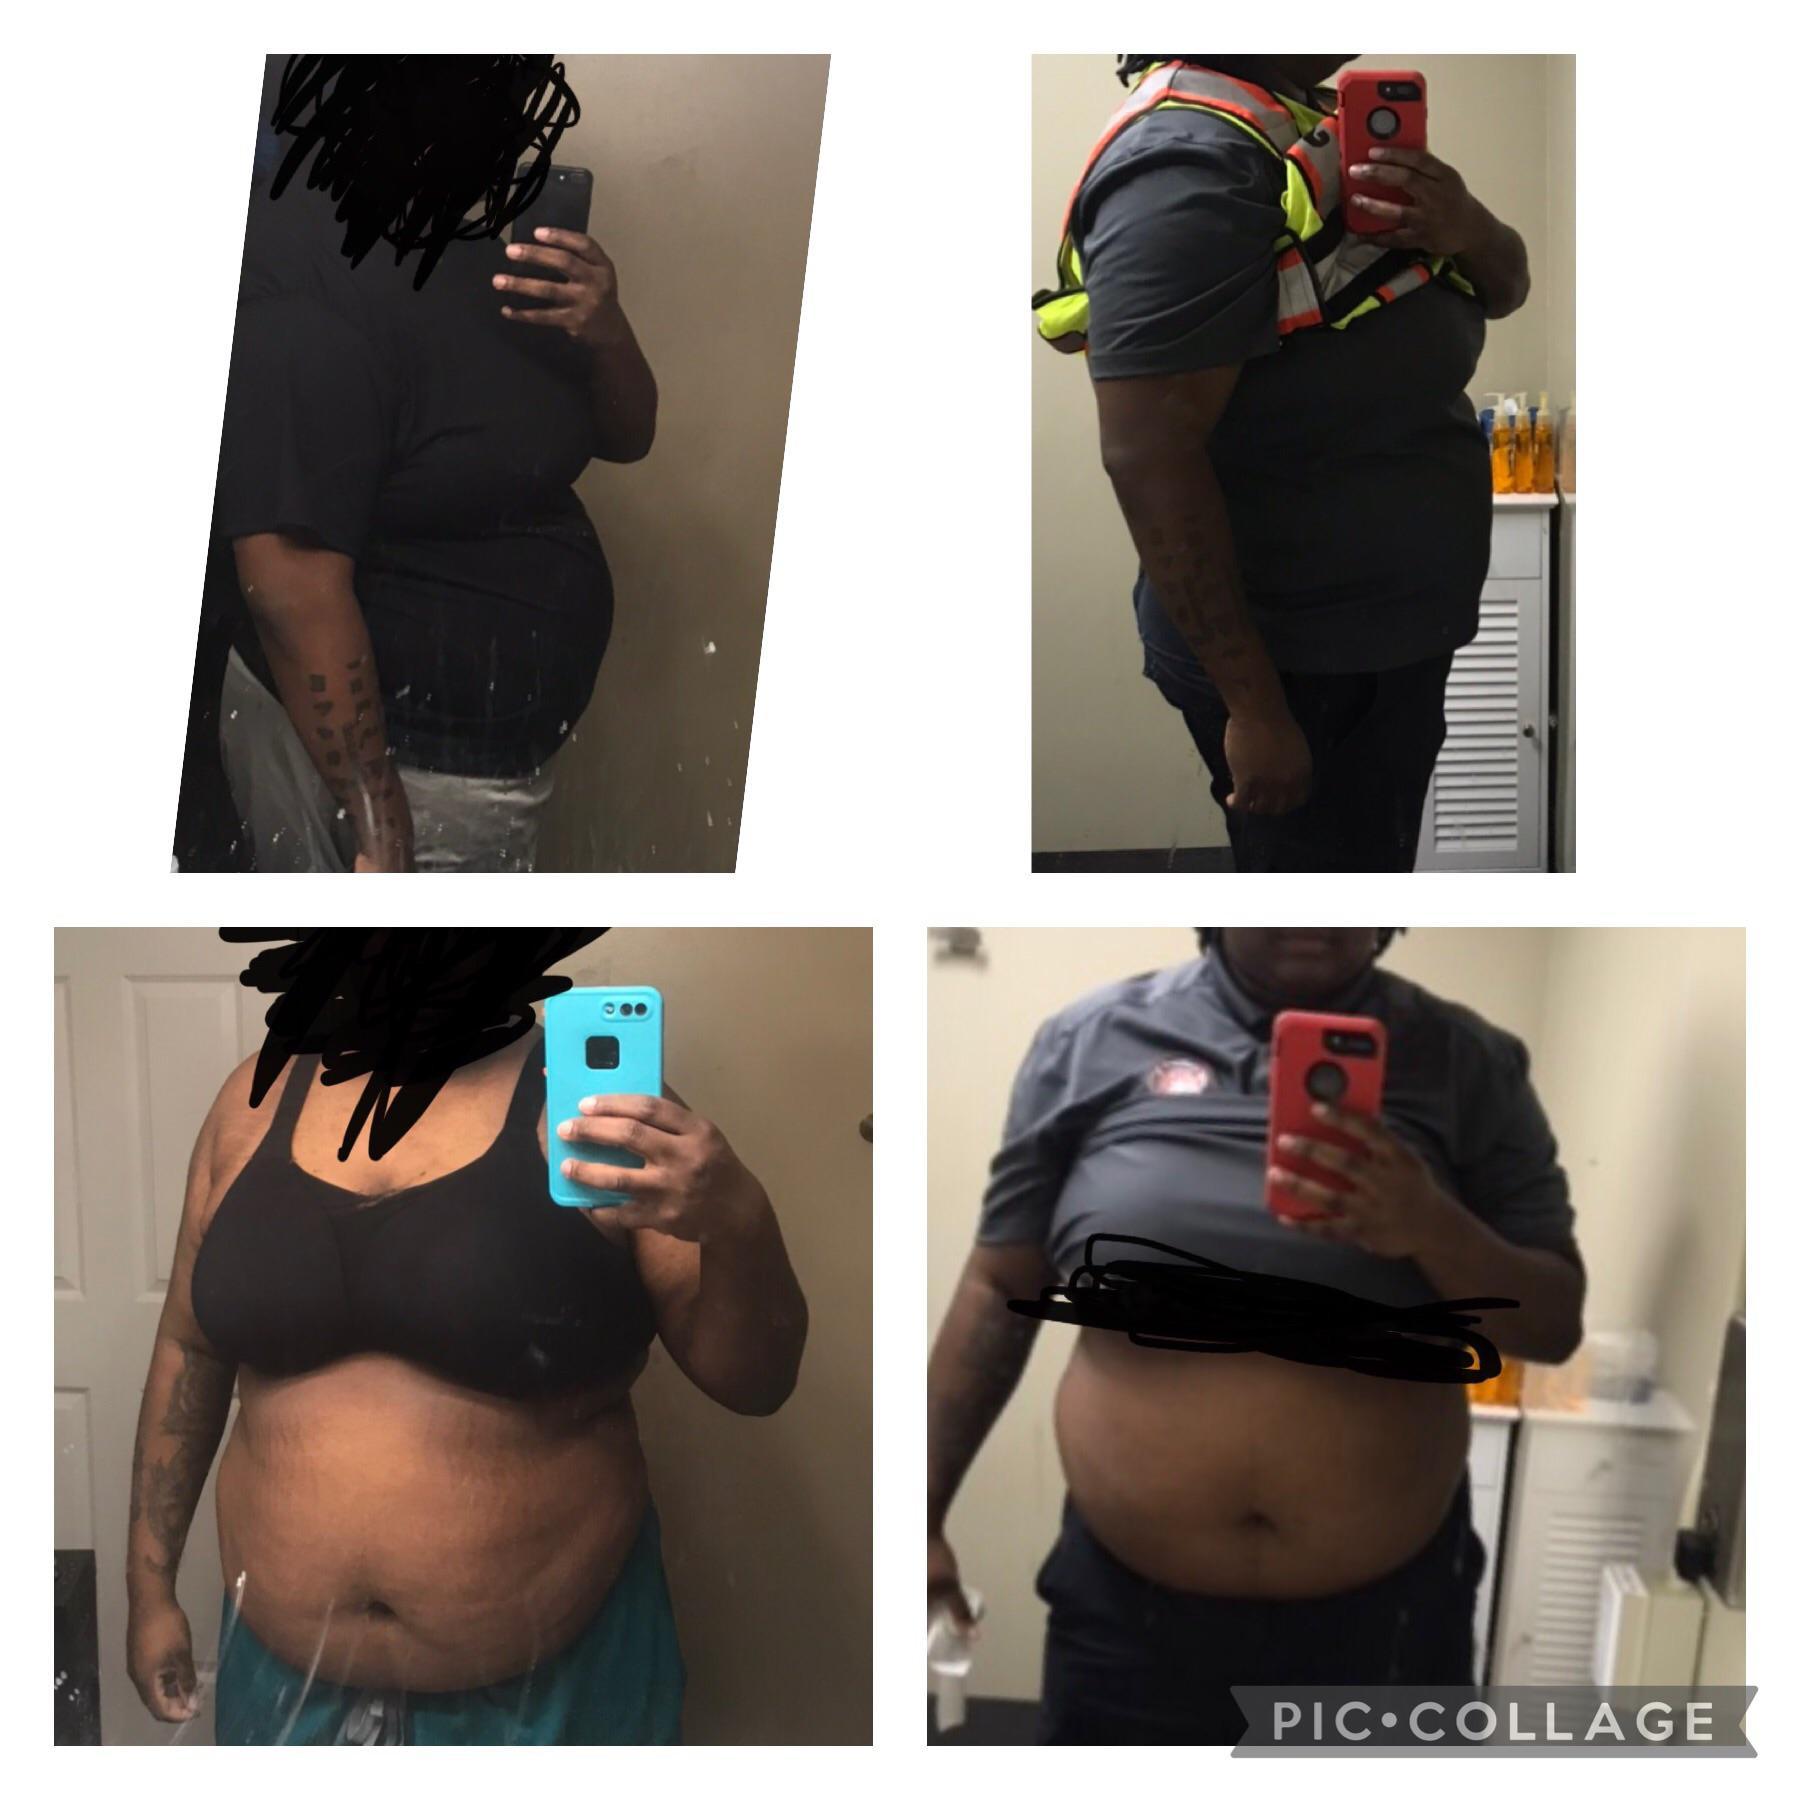 9 lbs Fat Loss 6 feet 1 Female 328 lbs to 319 lbs